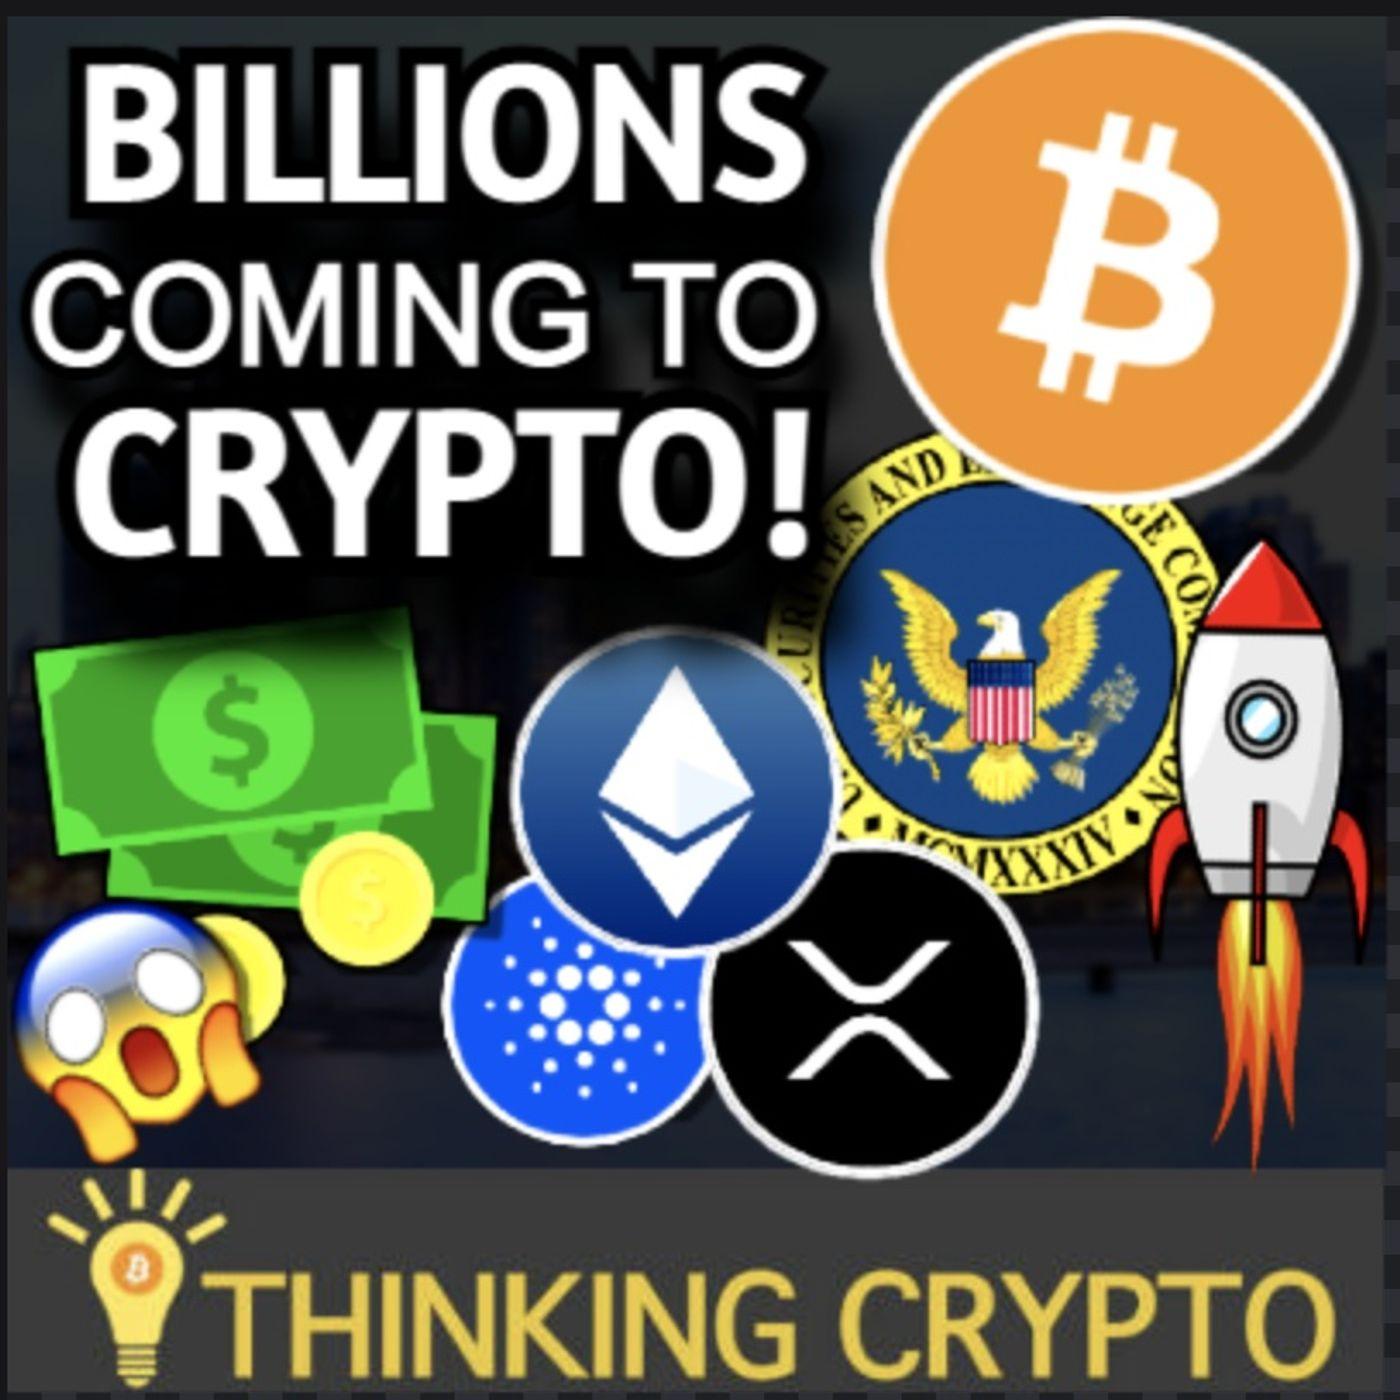 SEC Approves ProShares BITCOIN ETF - Jack Dorsey Bitcoin Mining - Nasdaq Valkerie BTC ETF - Tether Settlement